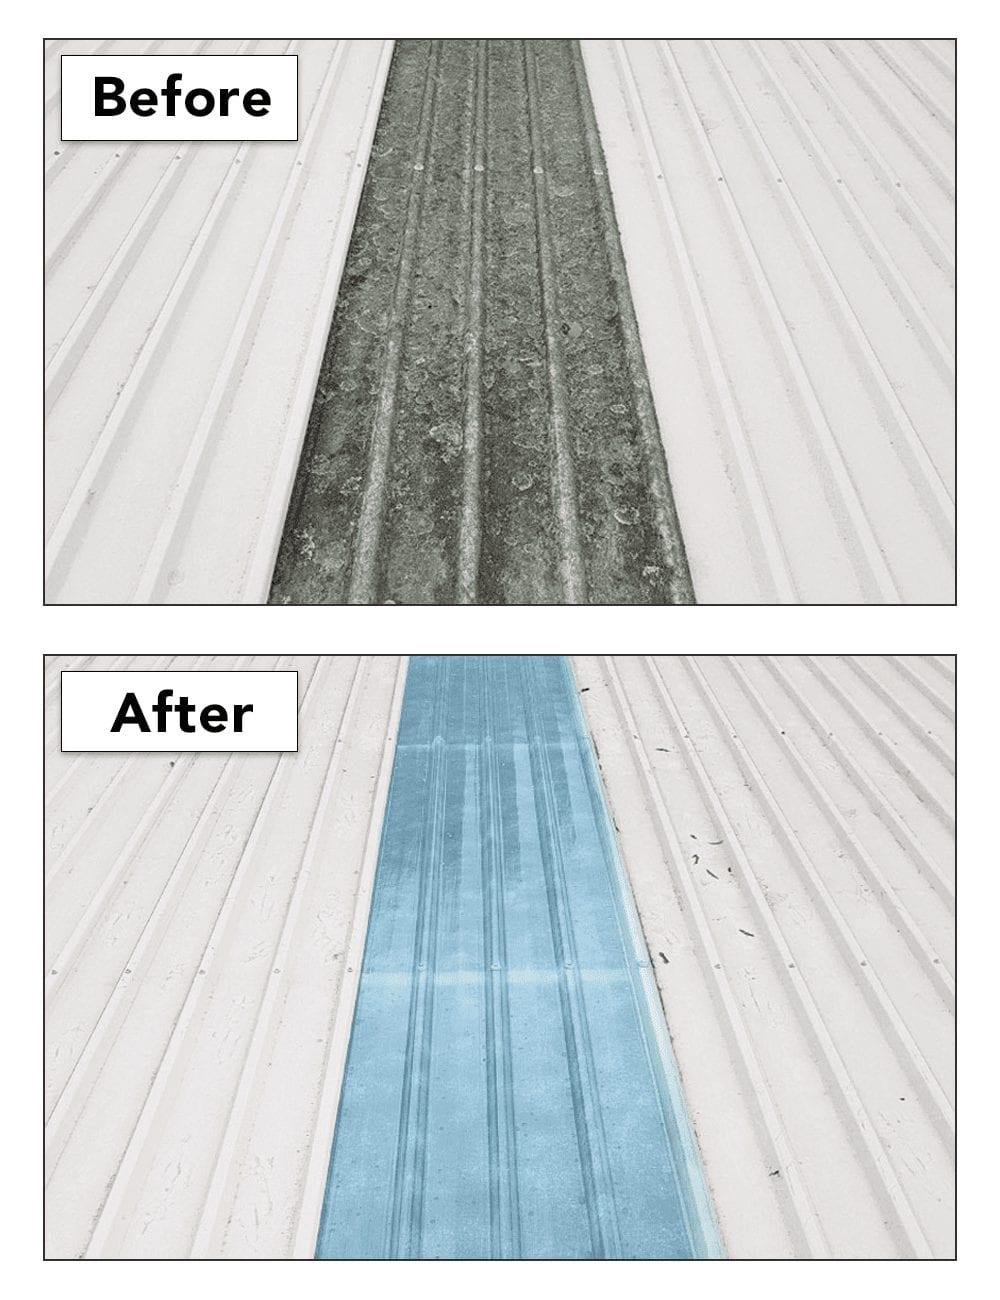 fibreglass roof sheets panels